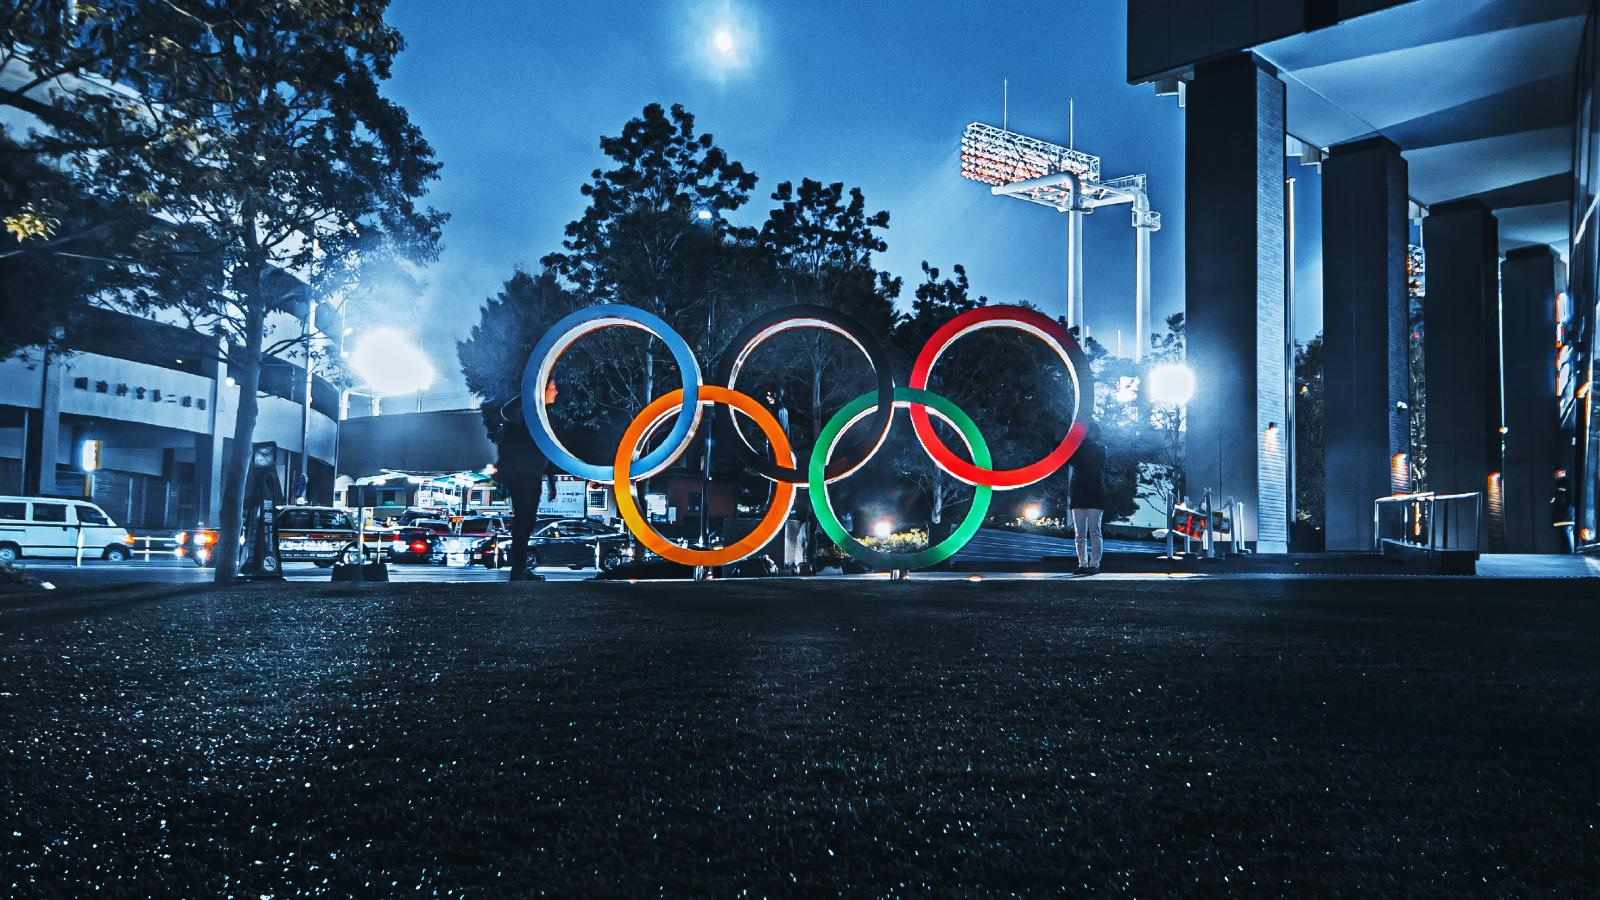 FBI: Threat actors may be targeting the 2020 Tokyo Summer Olympics